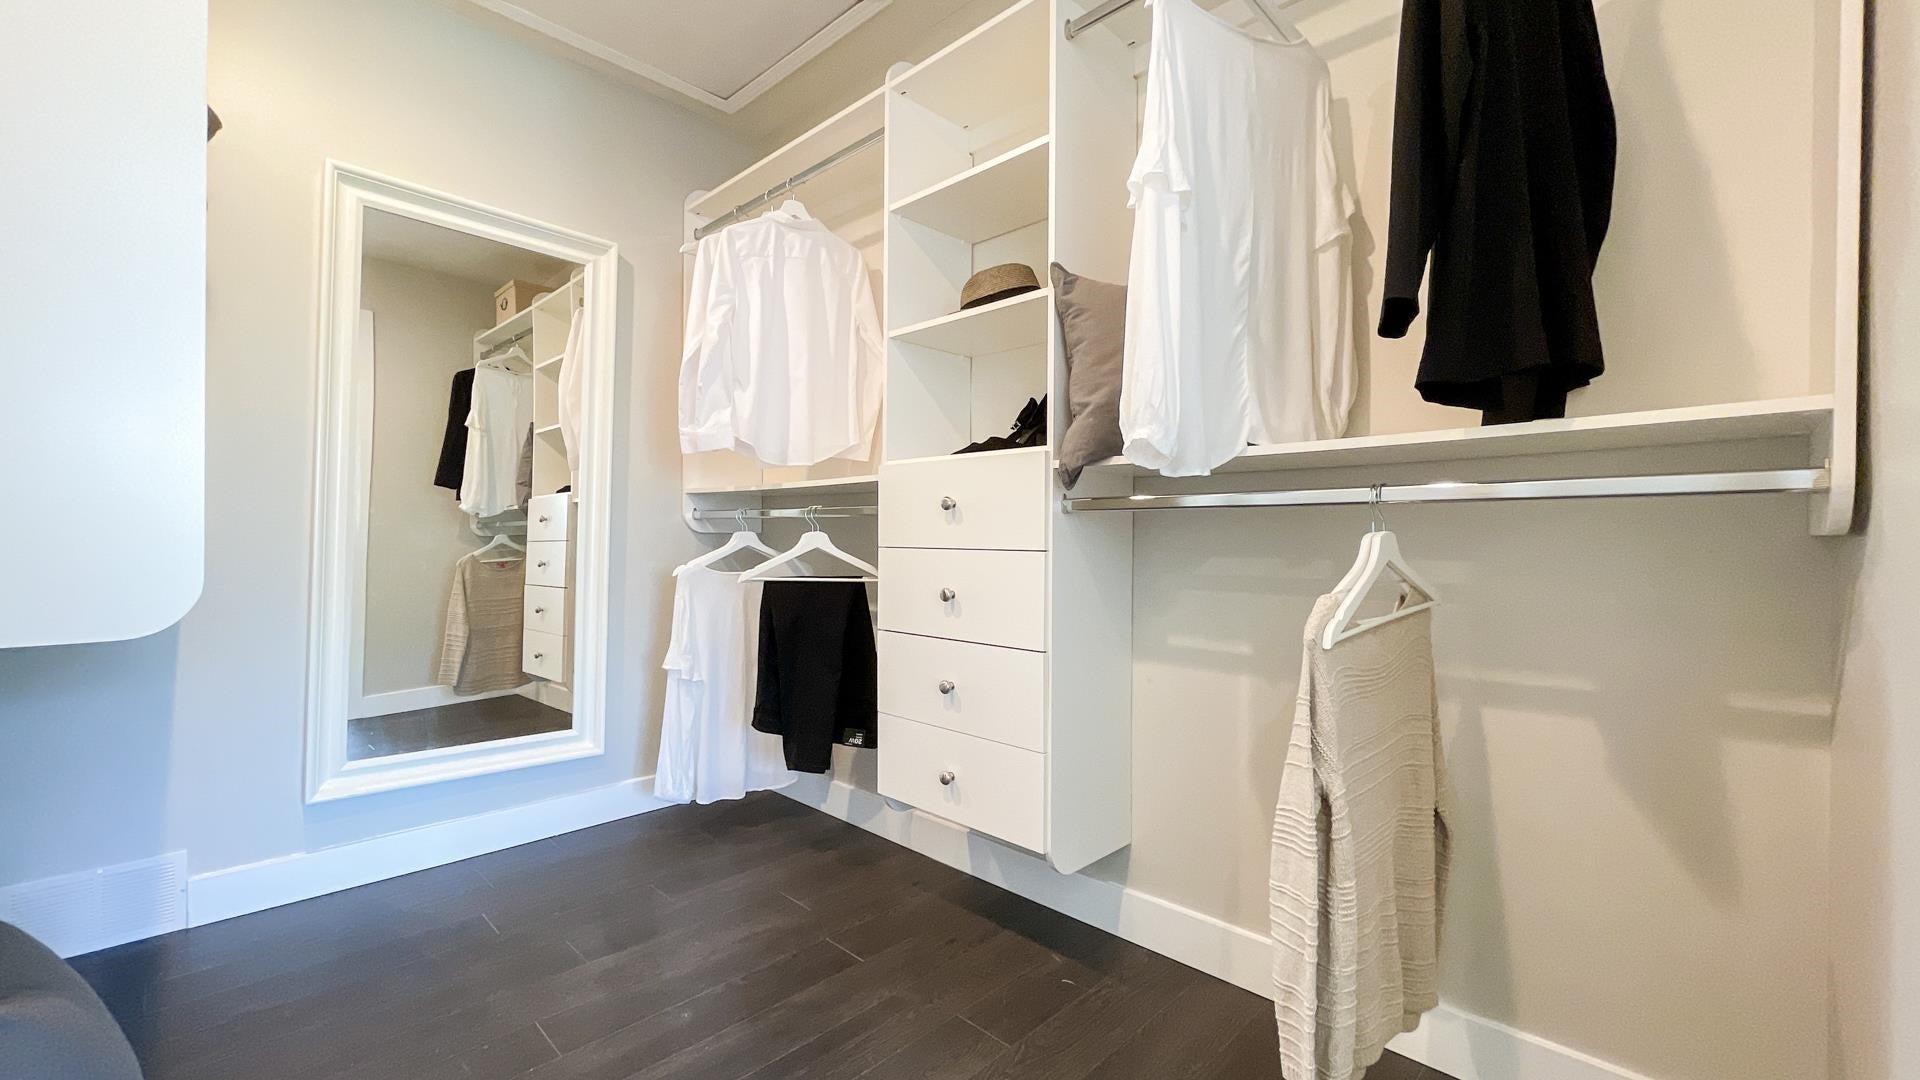 1168 JEFFERSON AVENUE - Ambleside House/Single Family for sale, 6 Bedrooms (R2602275) - #13